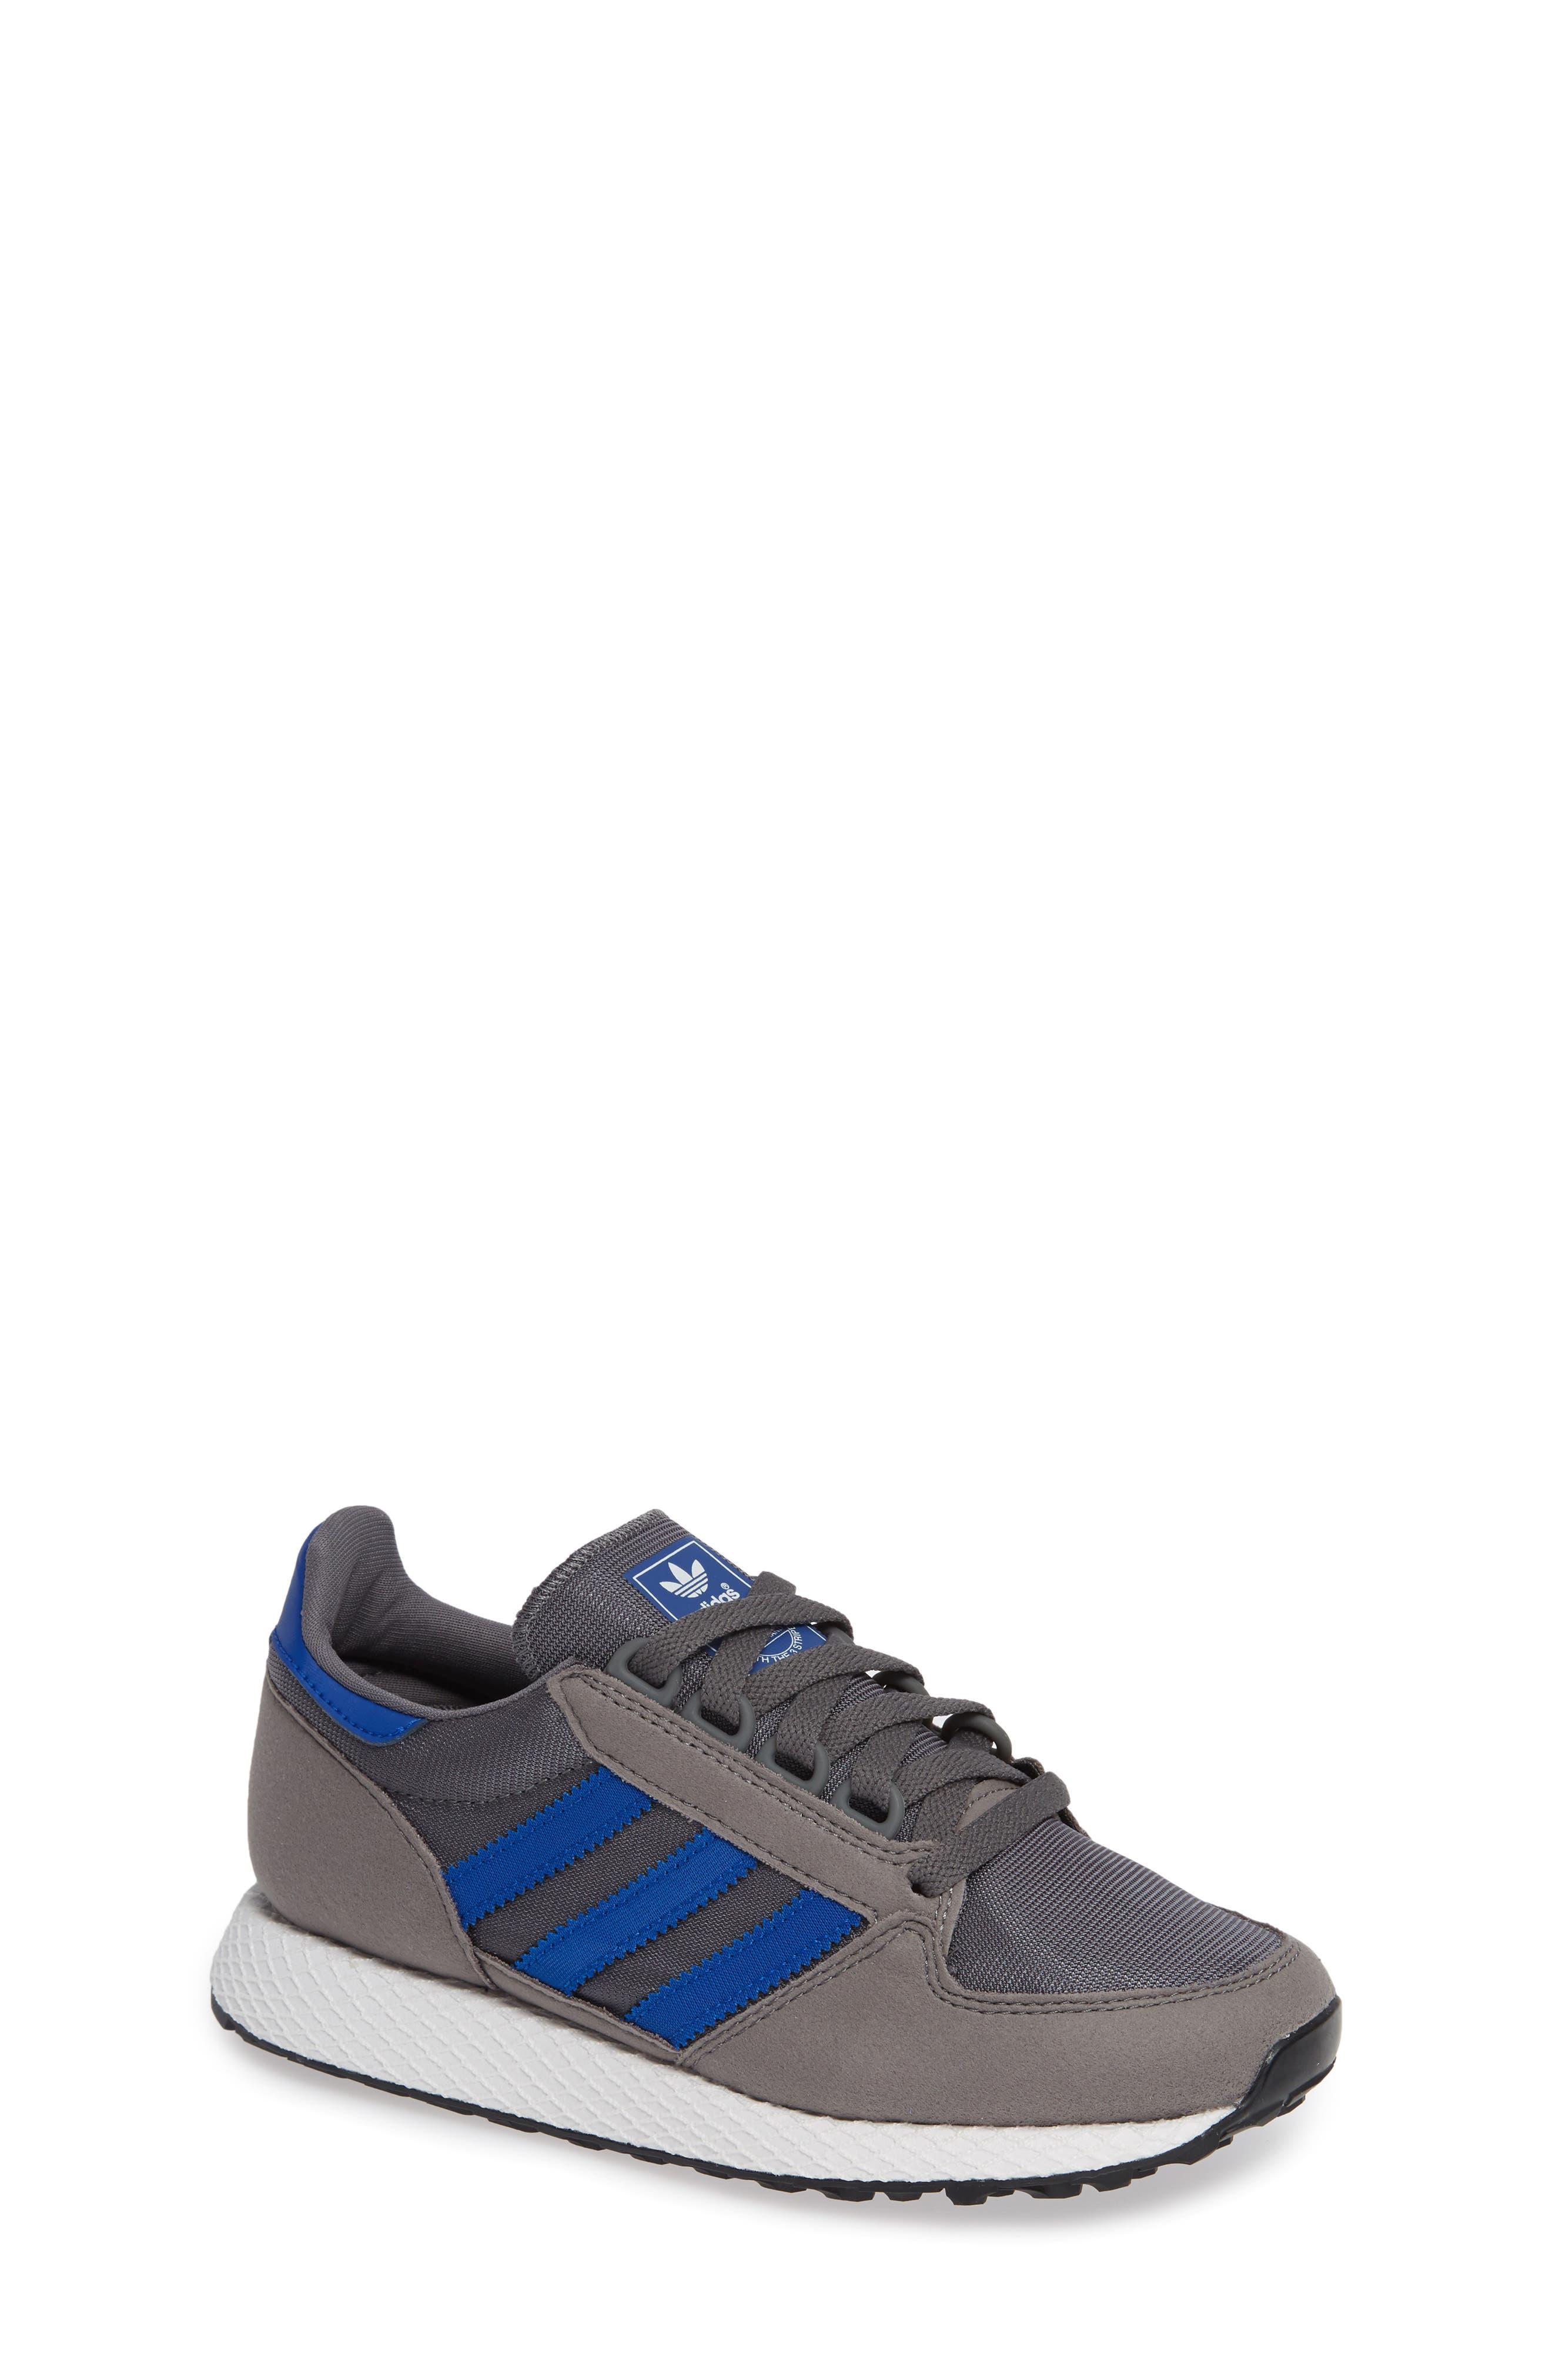 Forest Grove Sneaker,                         Main,                         color, GREY/ COLLEGIATE ROYAL/ WHITE